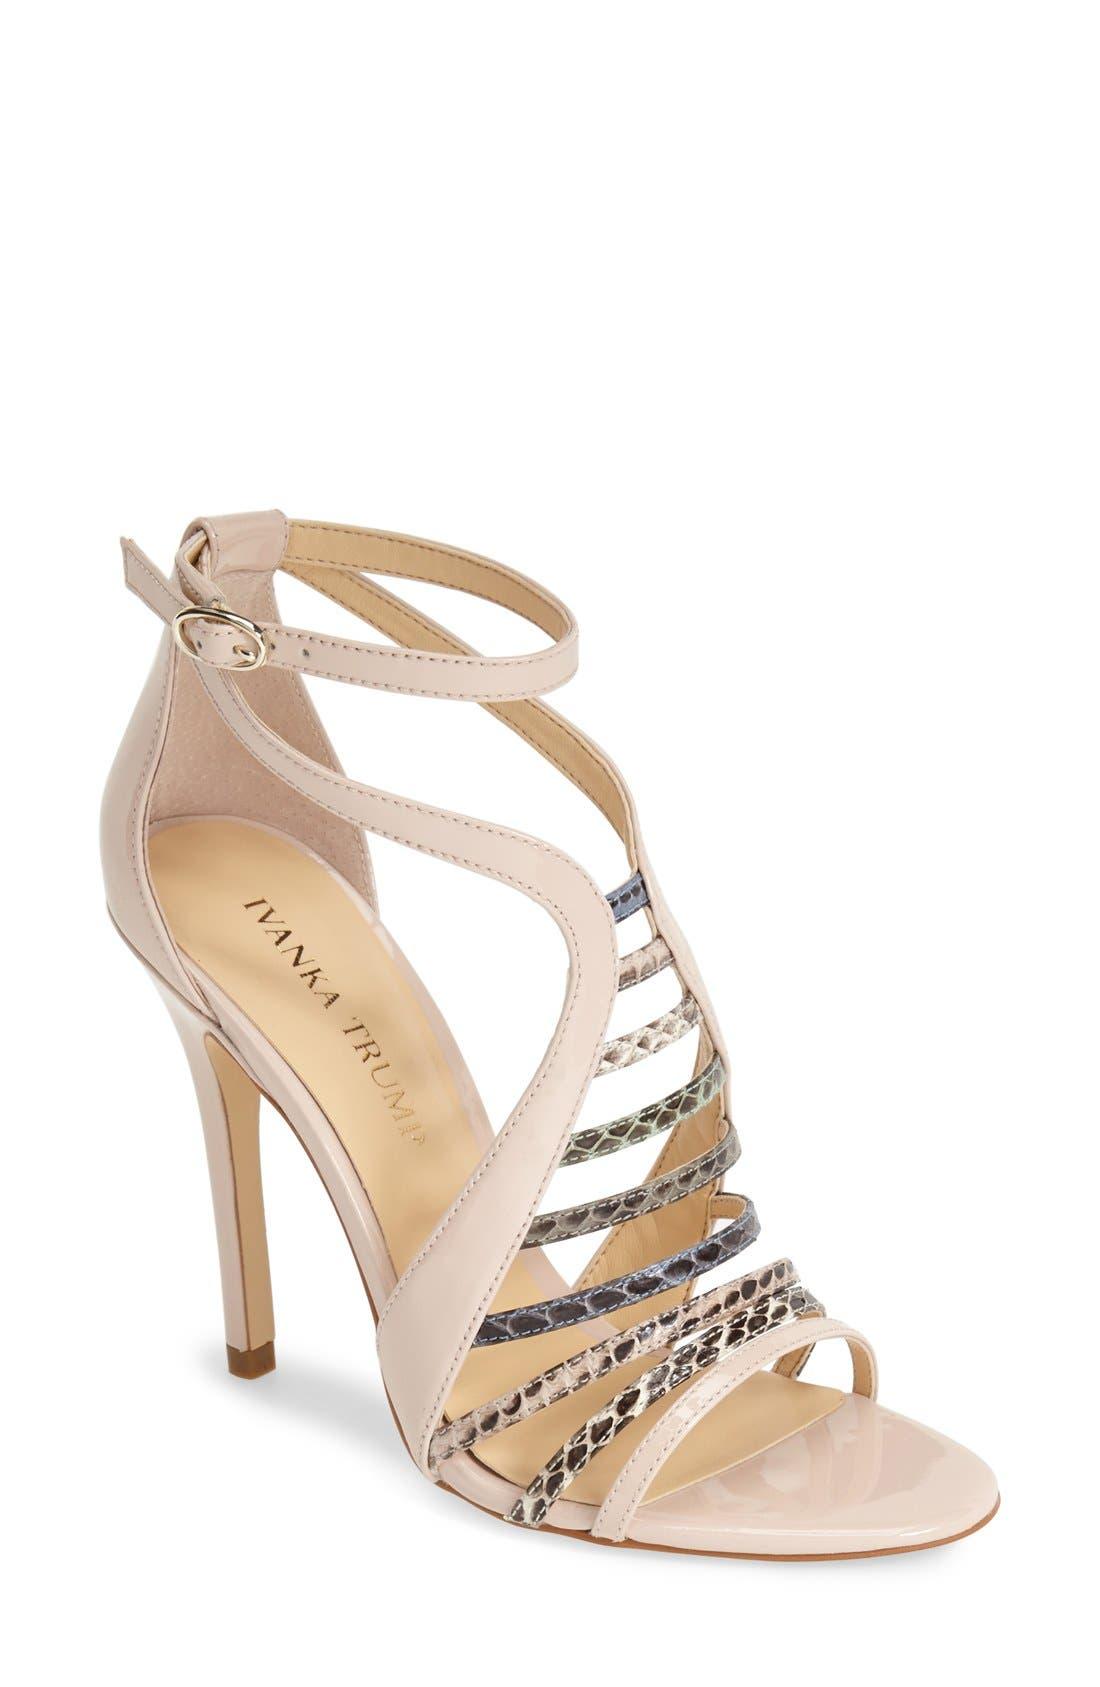 Alternate Image 1 Selected - Ivanka Trump 'Hayze' Ankle Strap Sandal (Women)